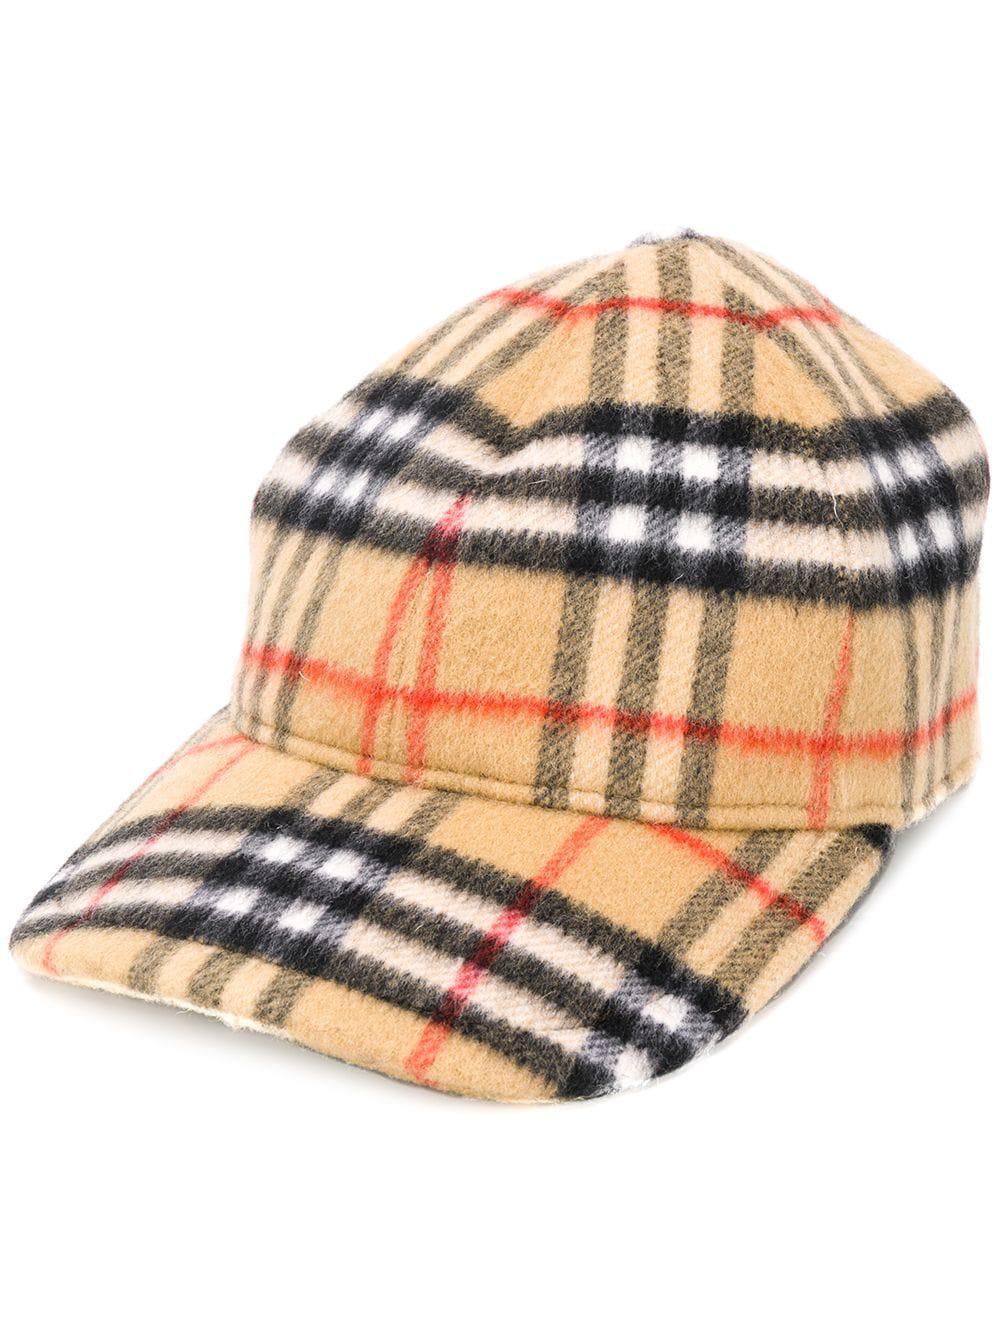 Burberry Checked Cotton-Canvas Baseball Cap In Camel  e7f2123c9b